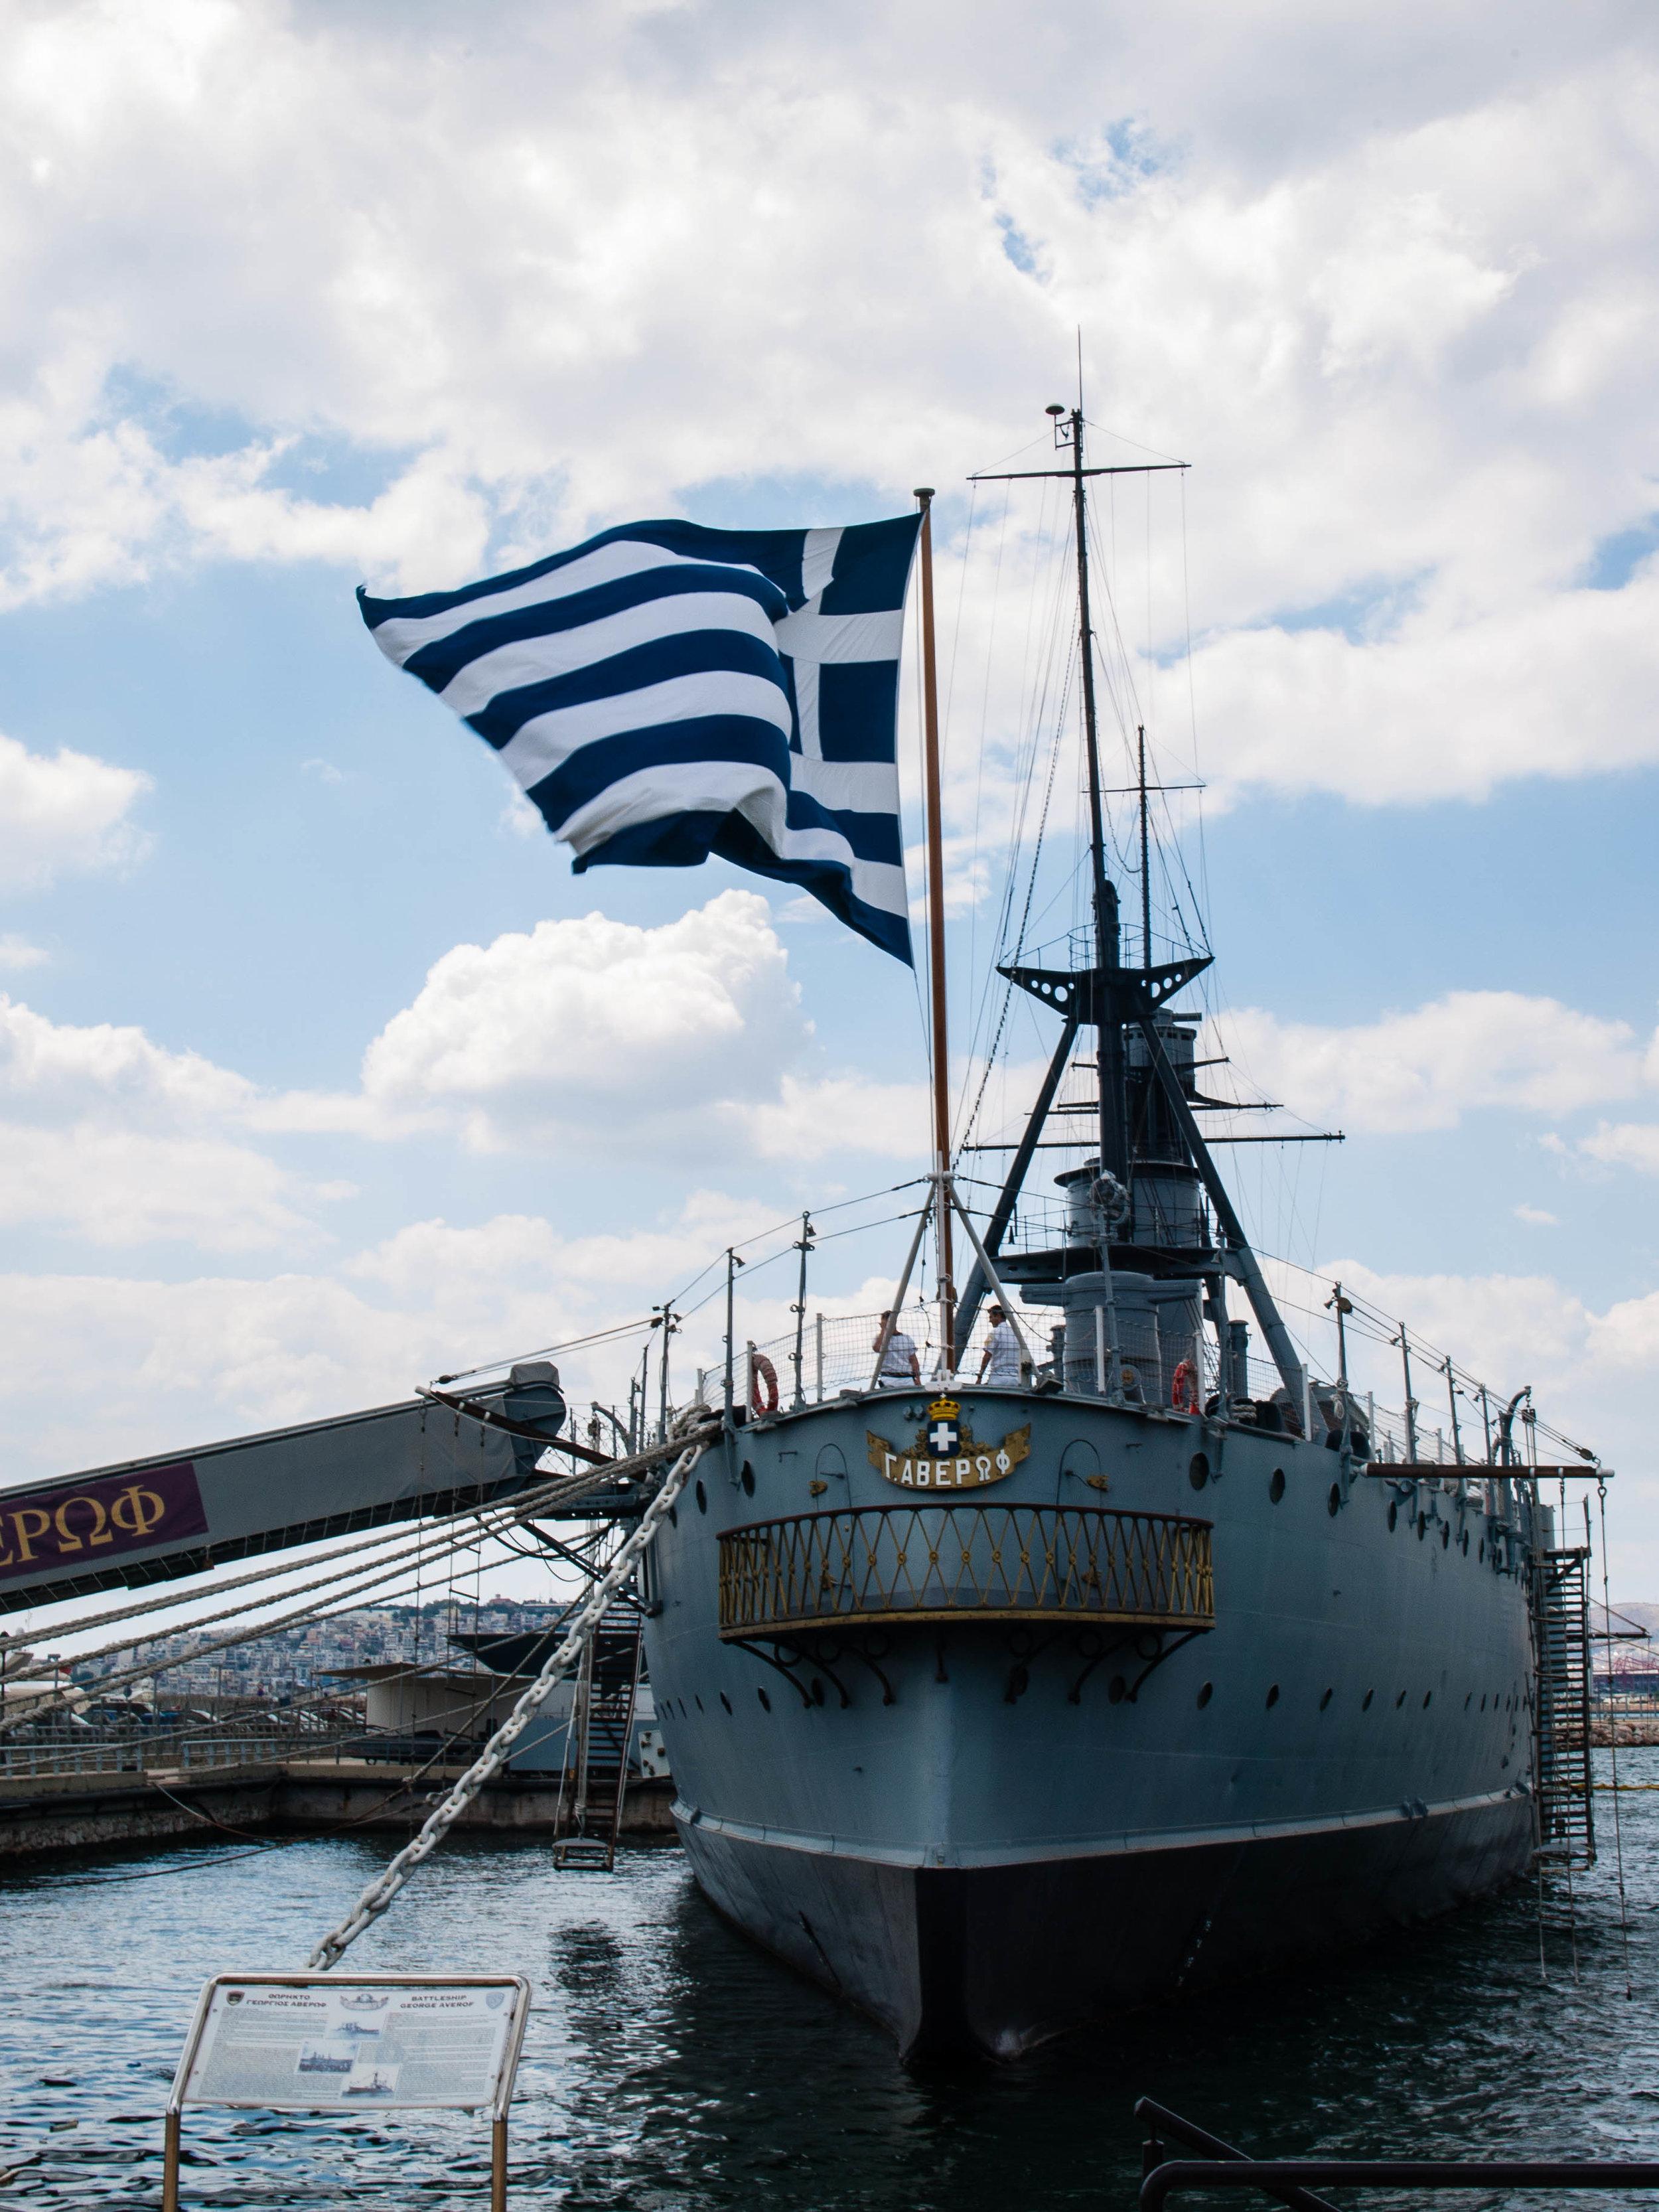 The Battleship 'Averof' floating museum (Picture by Katherine Poseidon)